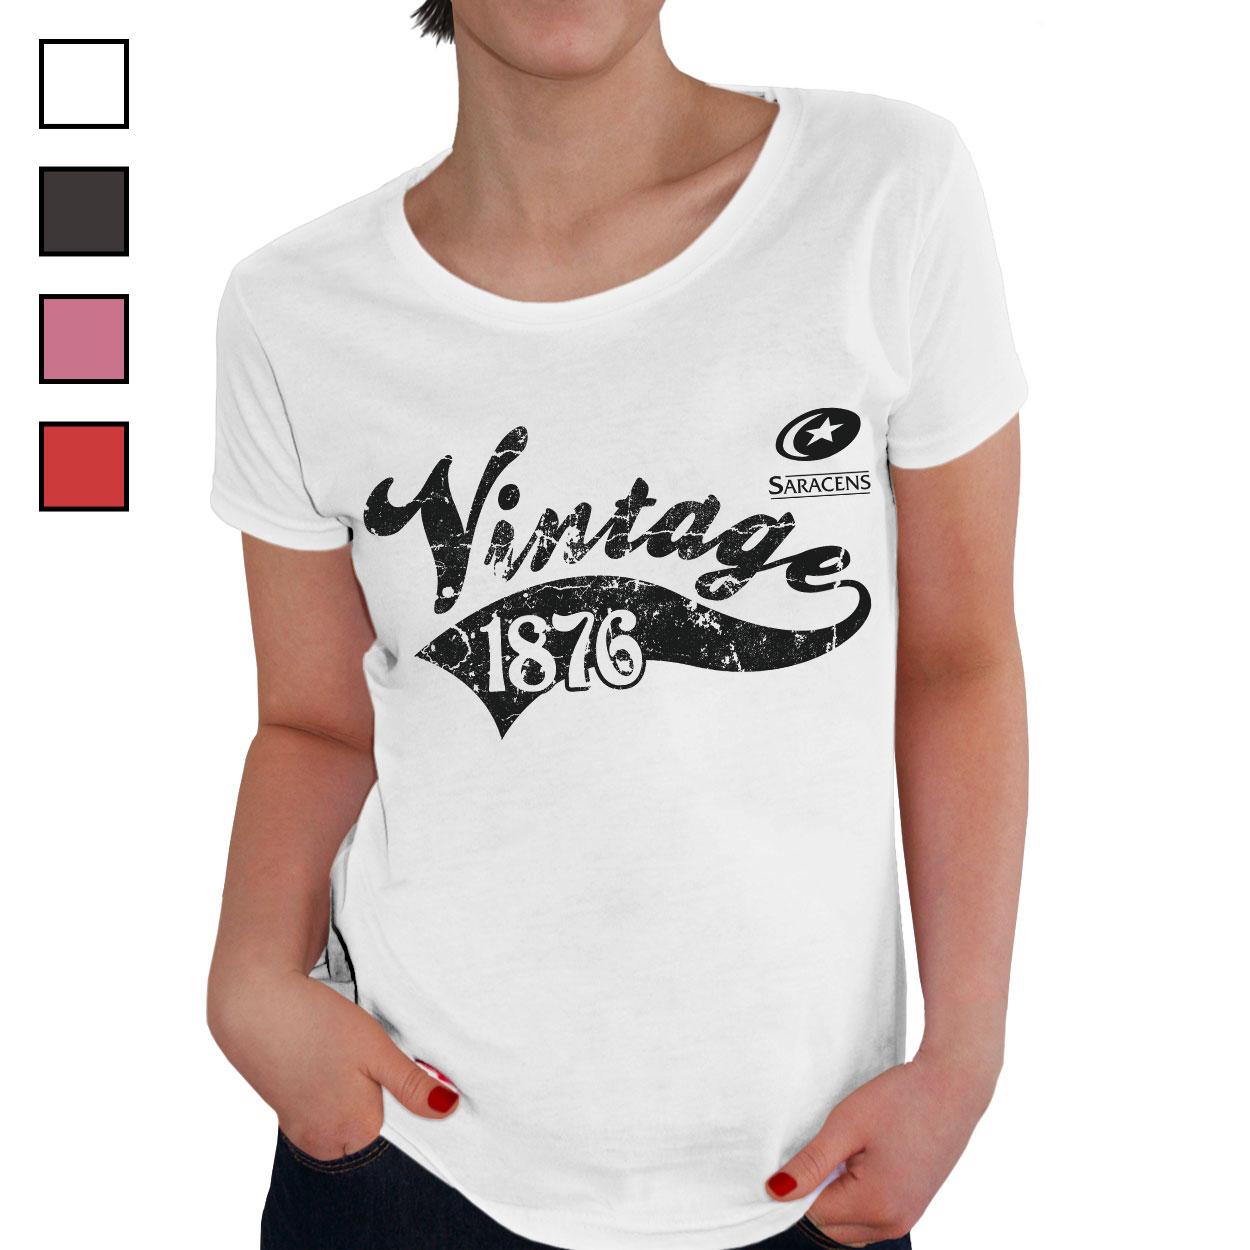 Saracens Ladies Vintage T-Shirt